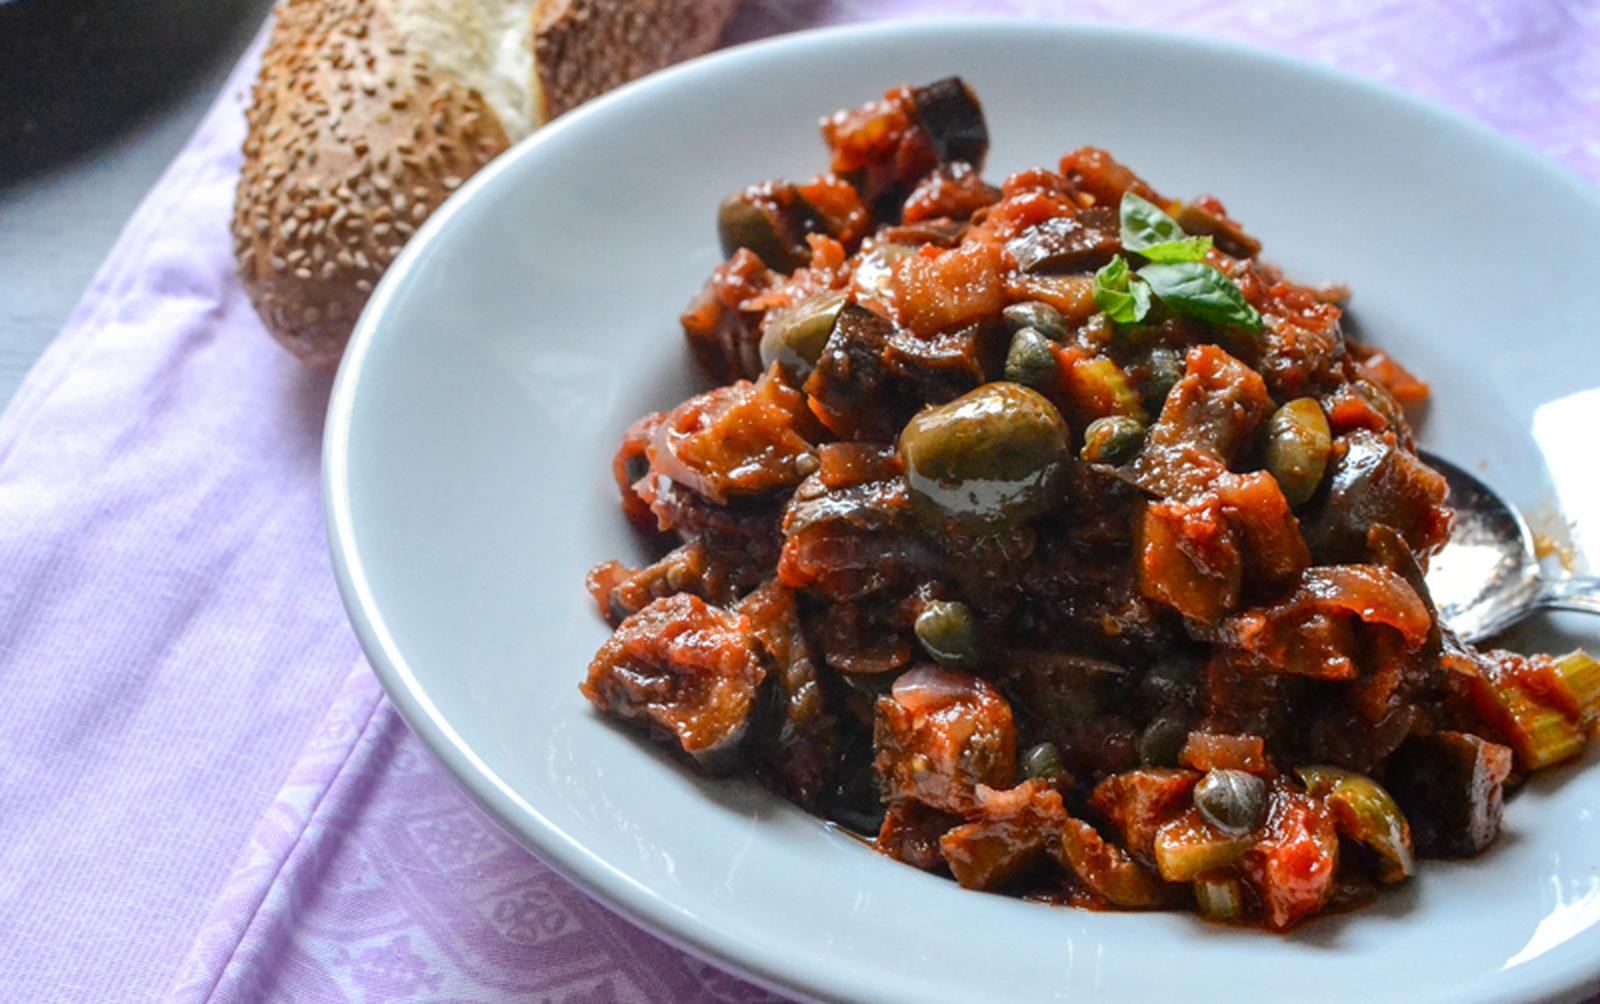 Caponata Siciliana (Sicilian Eggplant Antipasto) [Vegan, Gluten-Free]